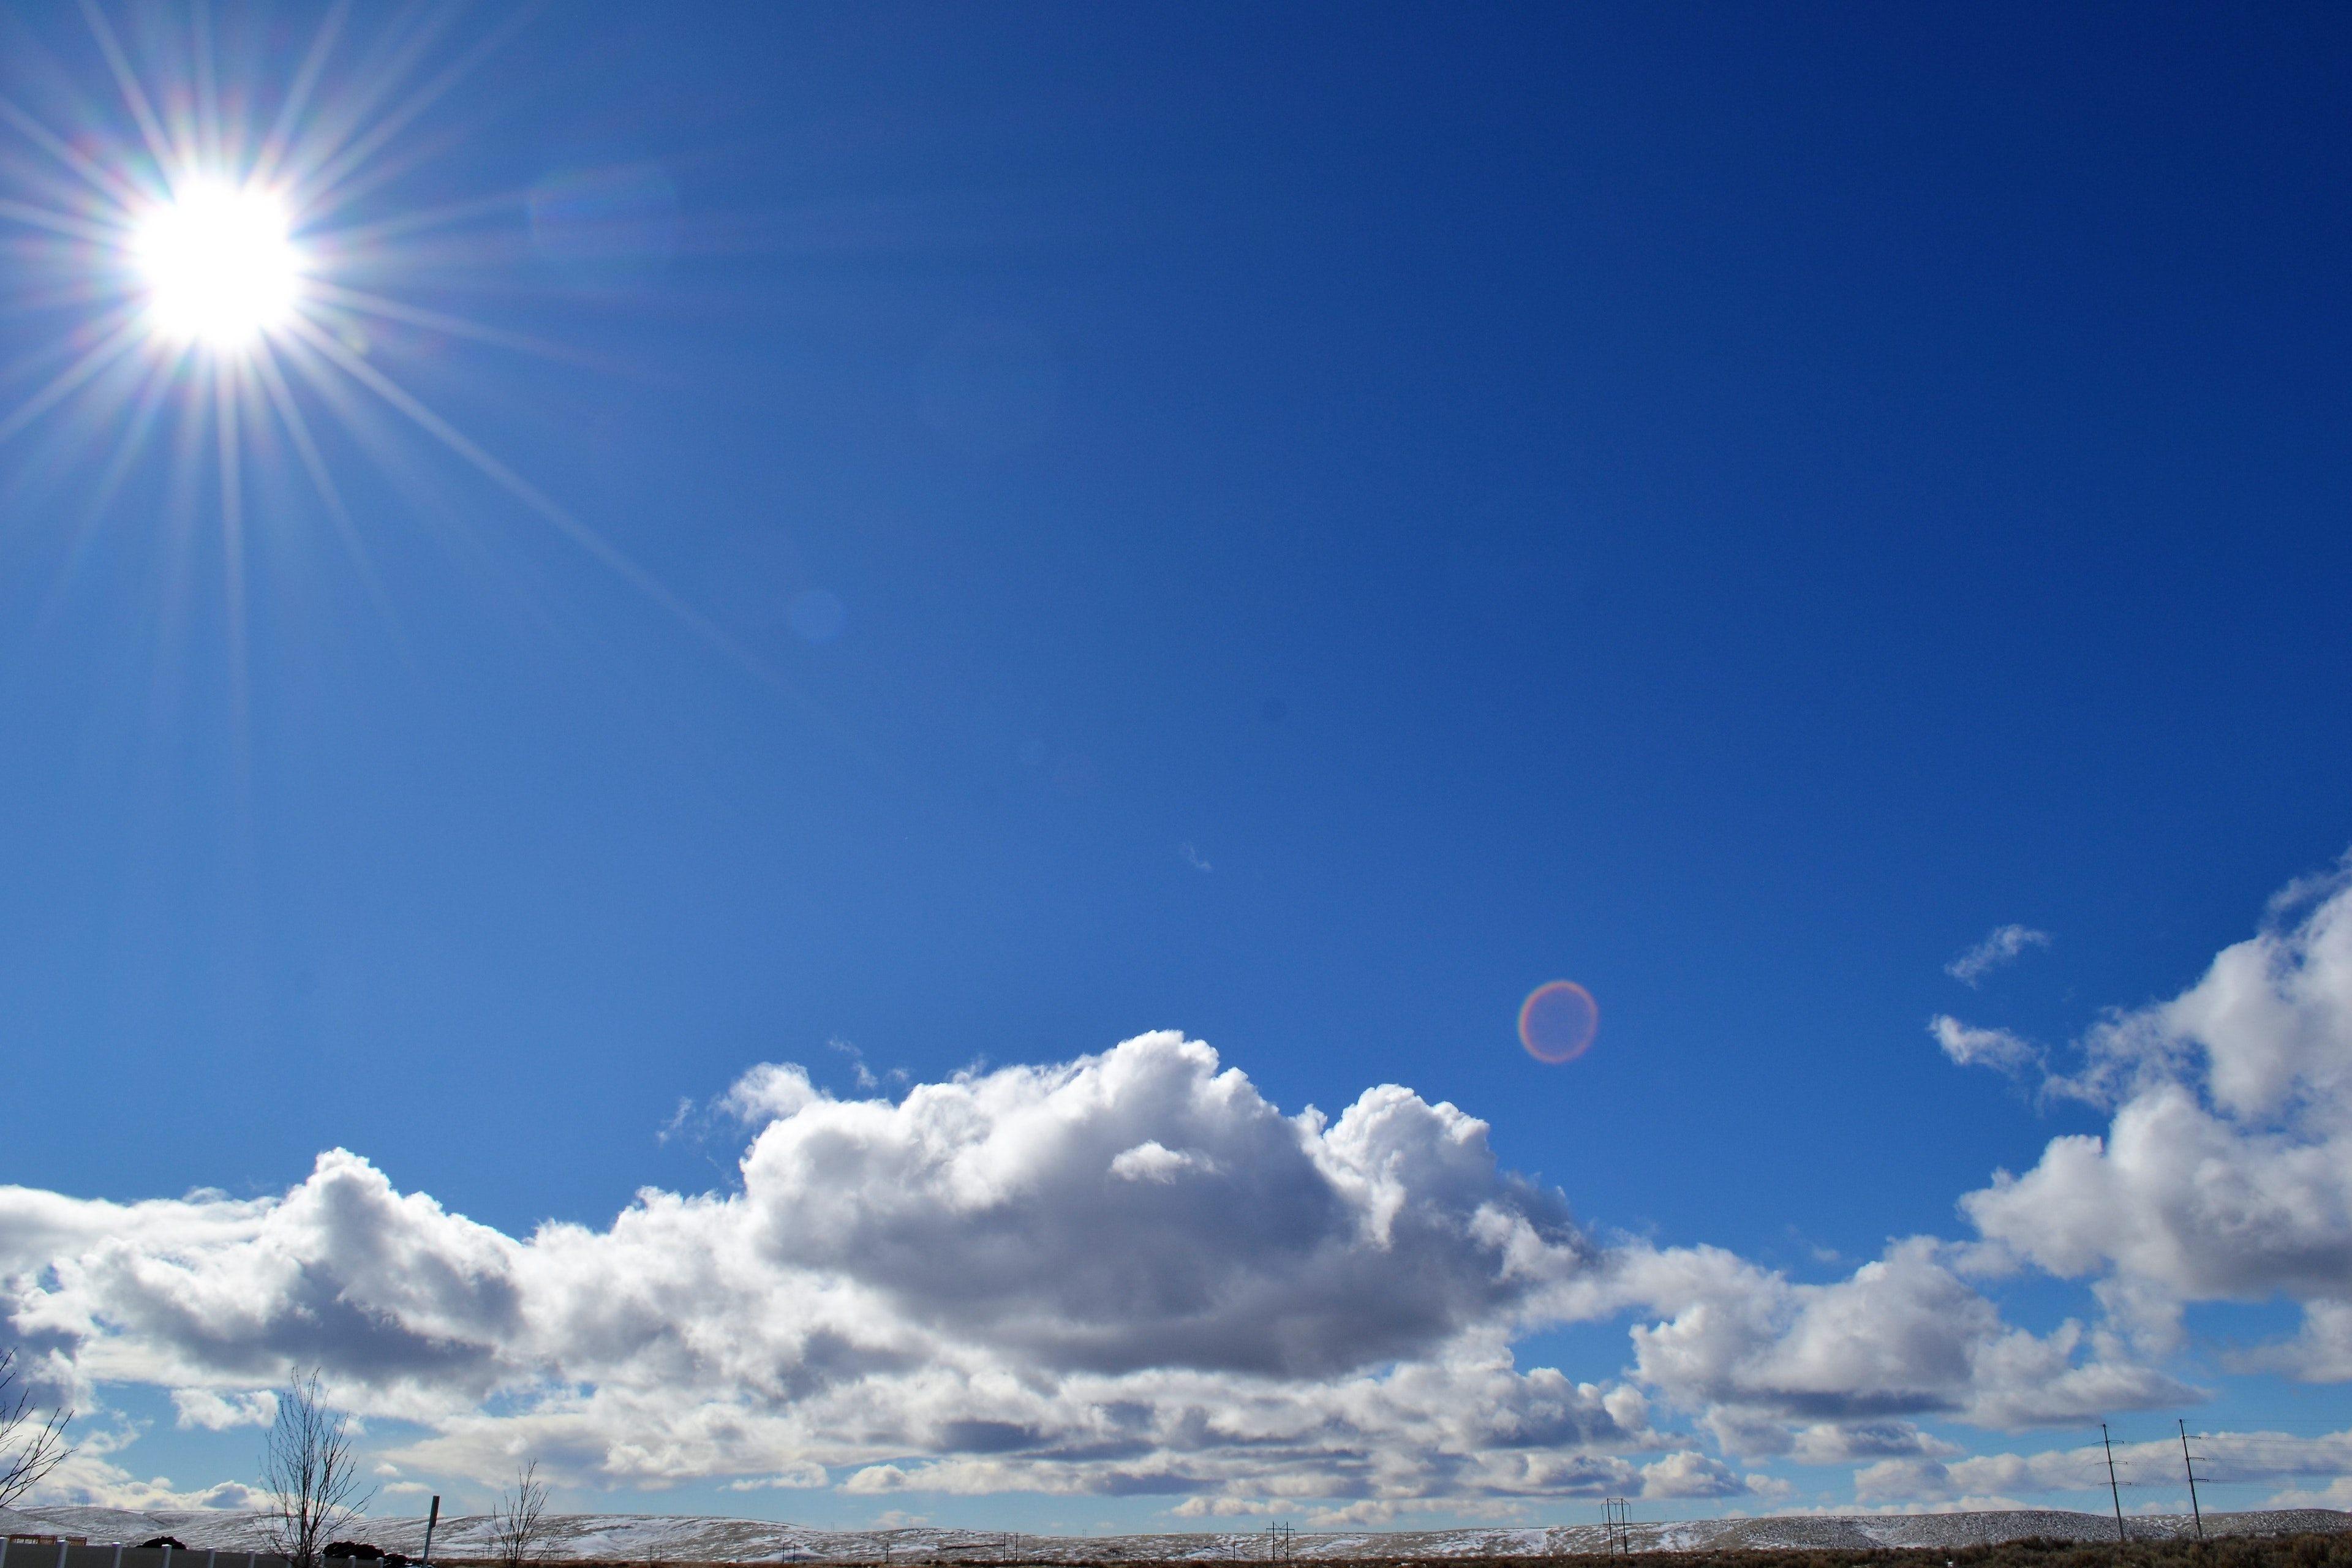 Sky Wallpaper 4k Posted By Ryan Johnson